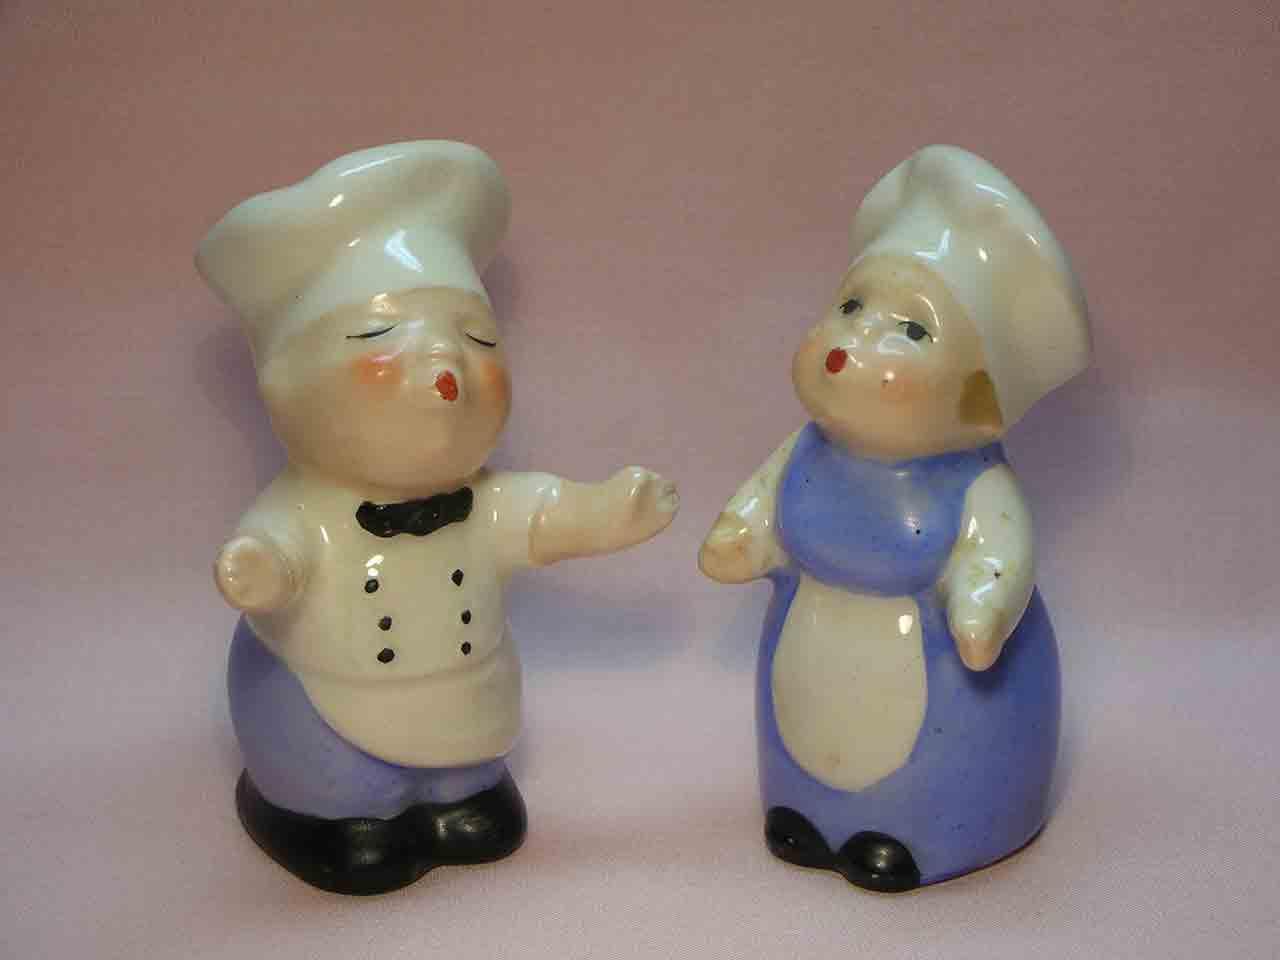 Goebel huggers salt and pepper shakers - chefs